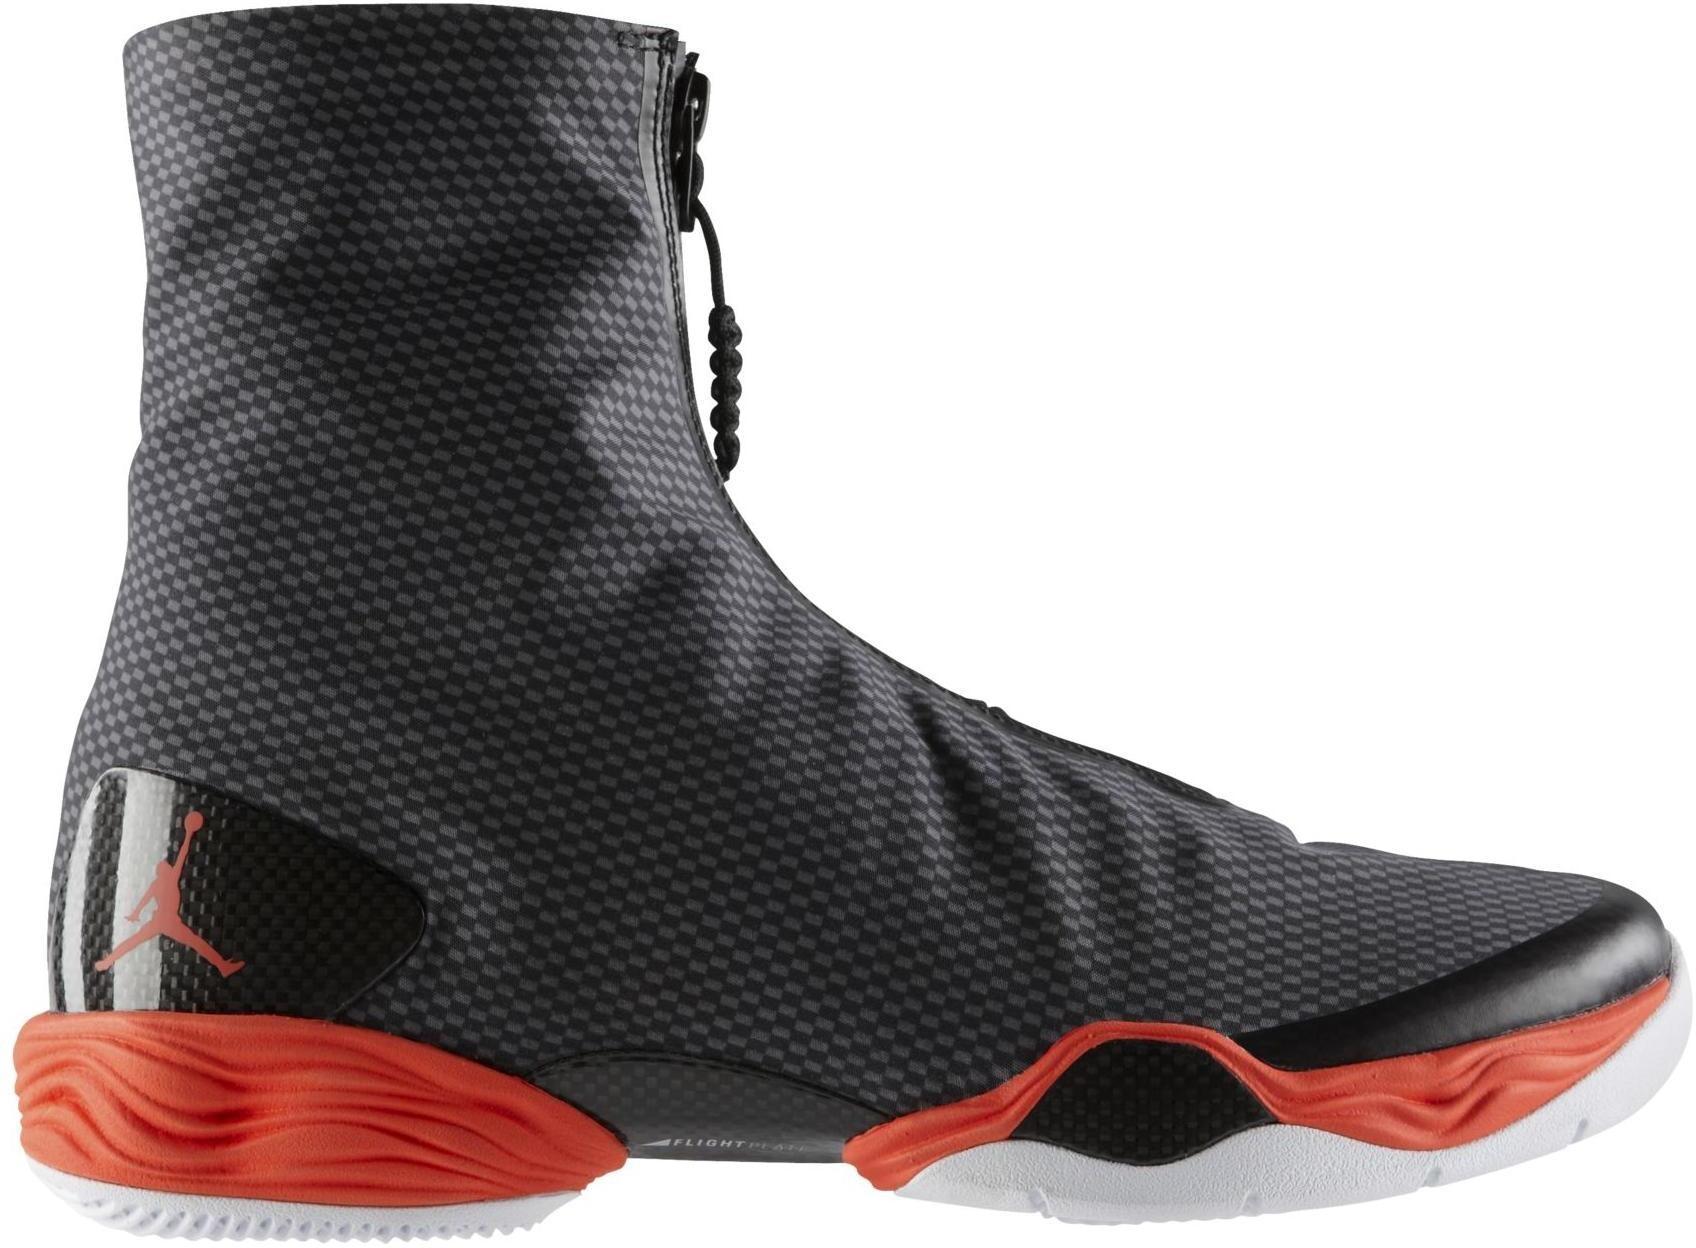 Jordan XX8 Carbon Fiber